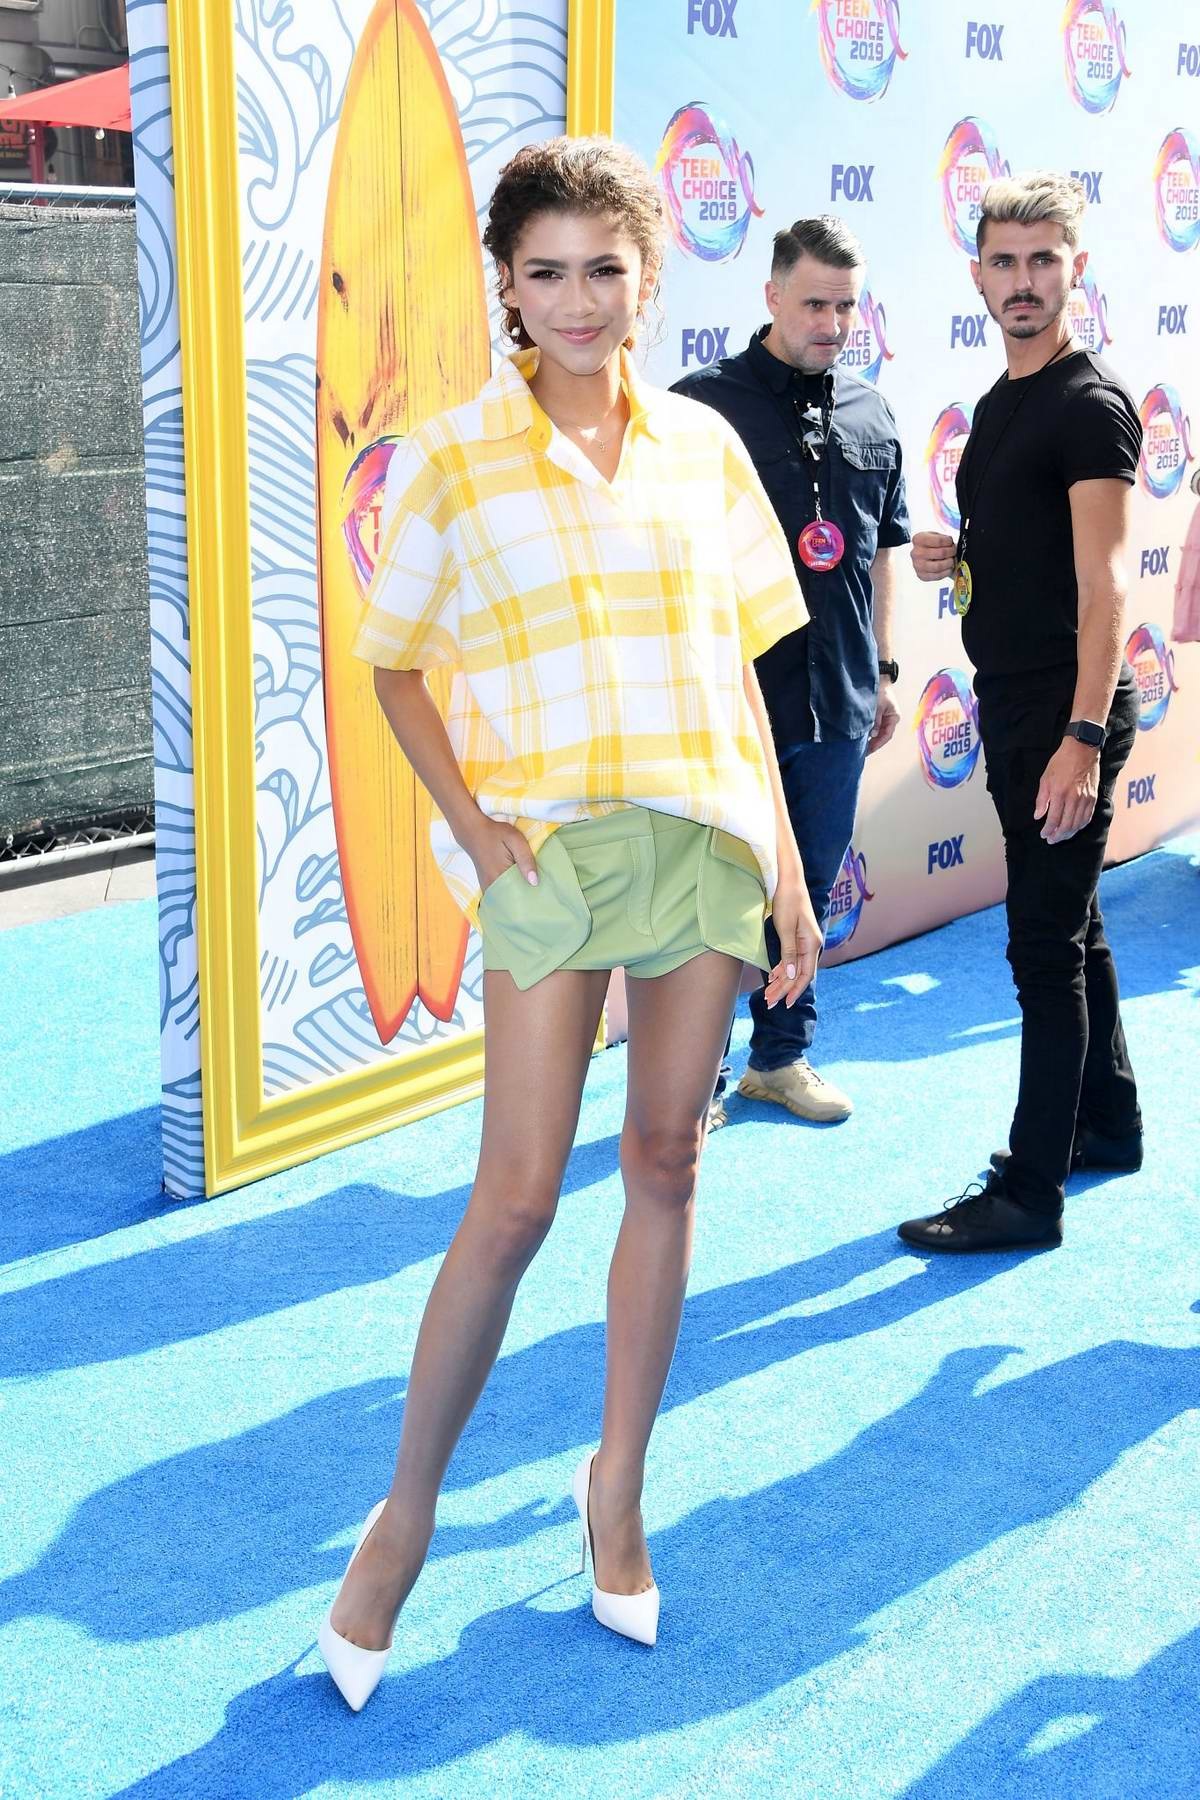 Zendaya attends the FOX's Teen Choice Awards 2019 in Hermosa Beach, California